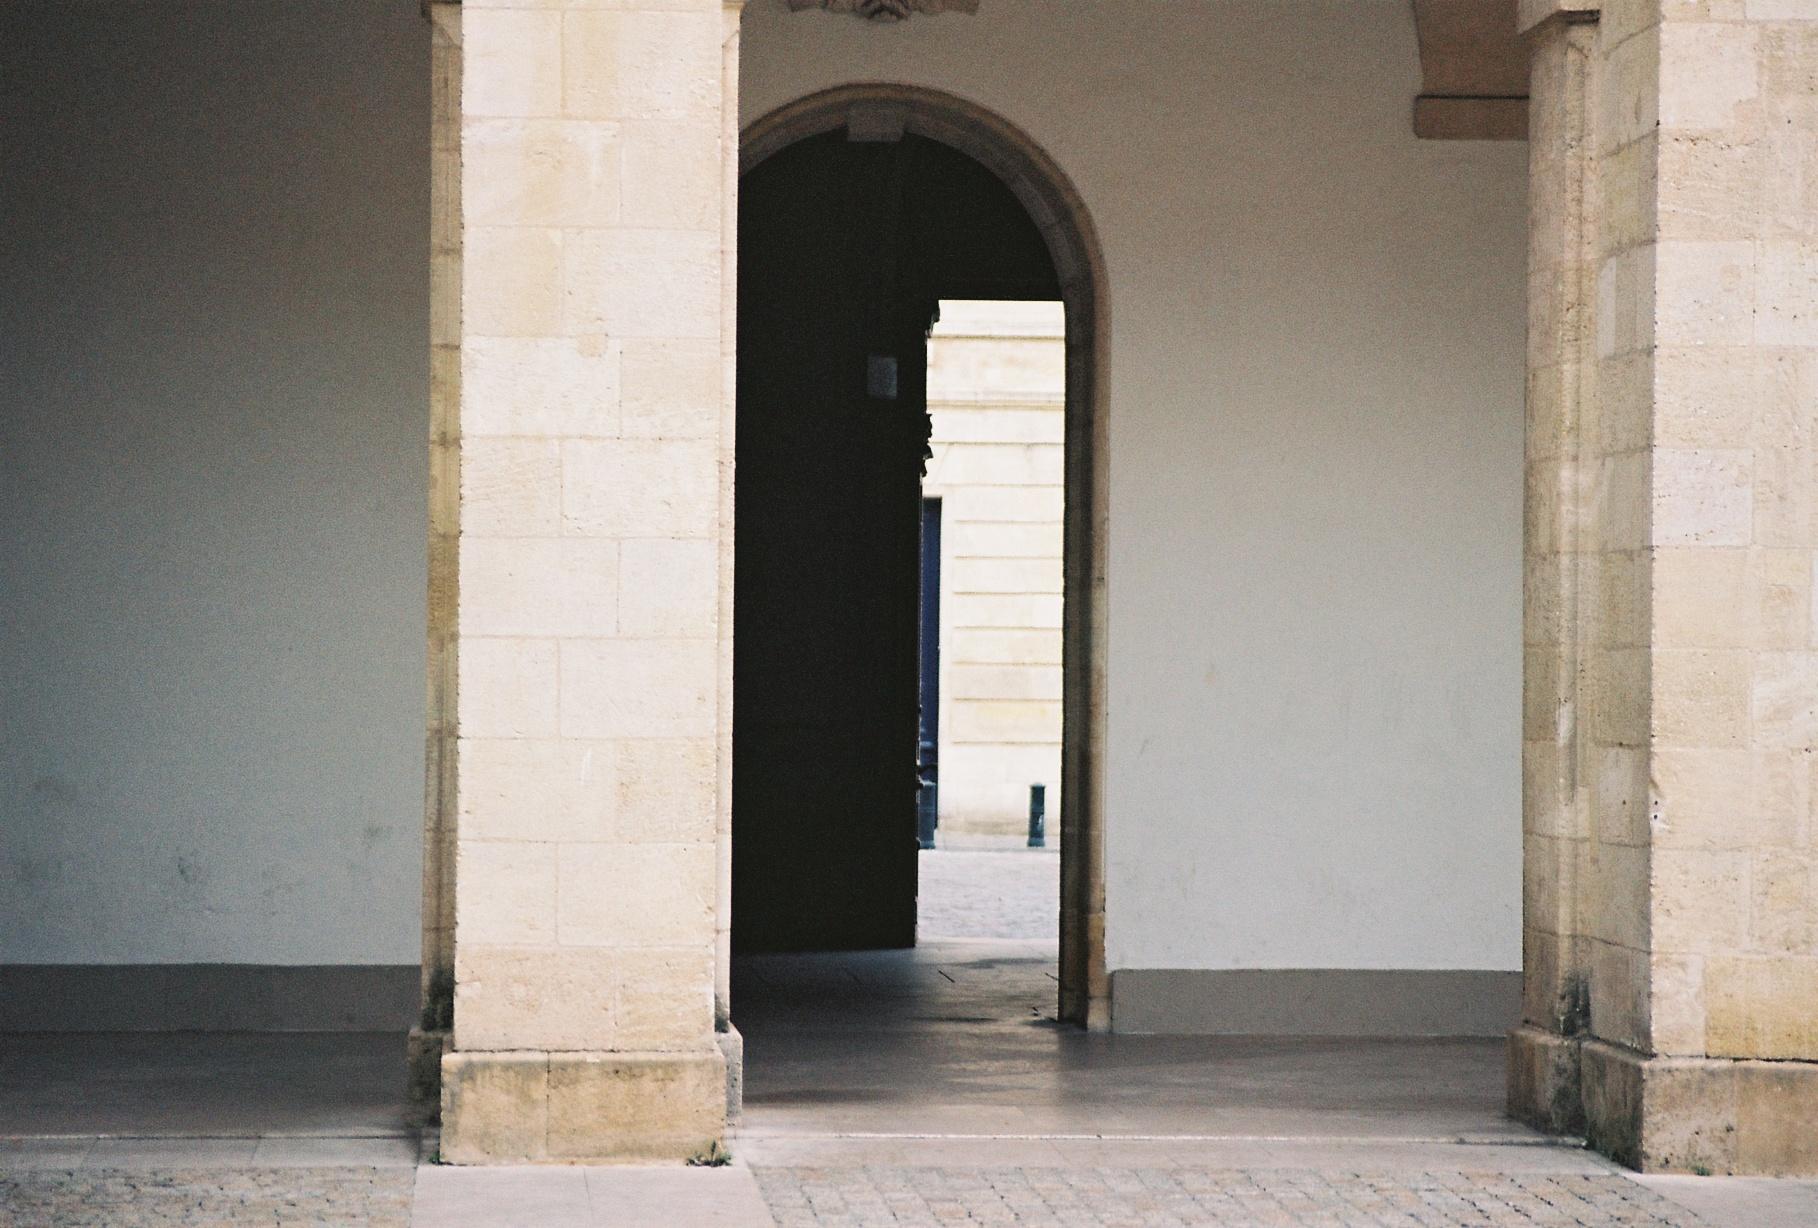 Building, City, Door, Entry, Exit, HQ Photo